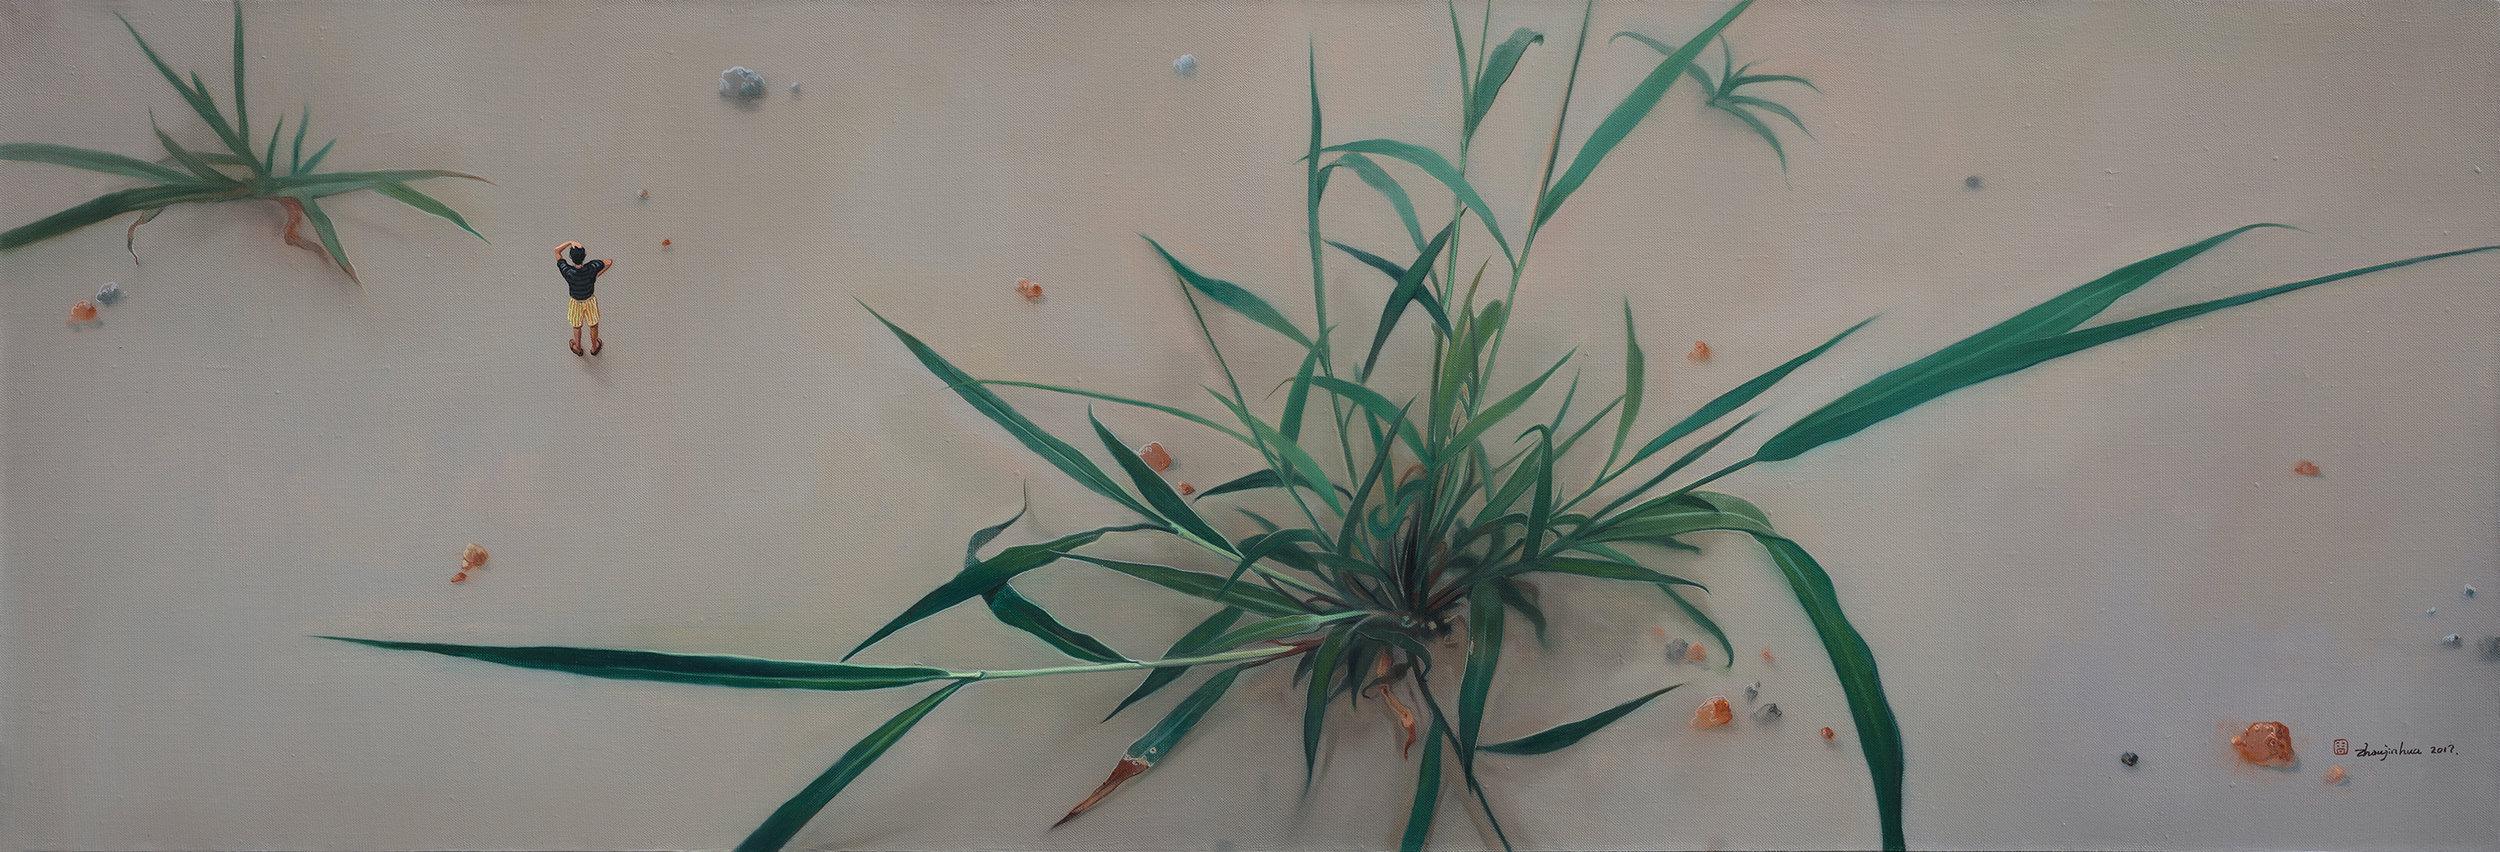 Zhou Jinhua 周金华, Wild Grass 野草 No.8, 2017, Oil on canvas 布面油彩, 41 x 121 cm